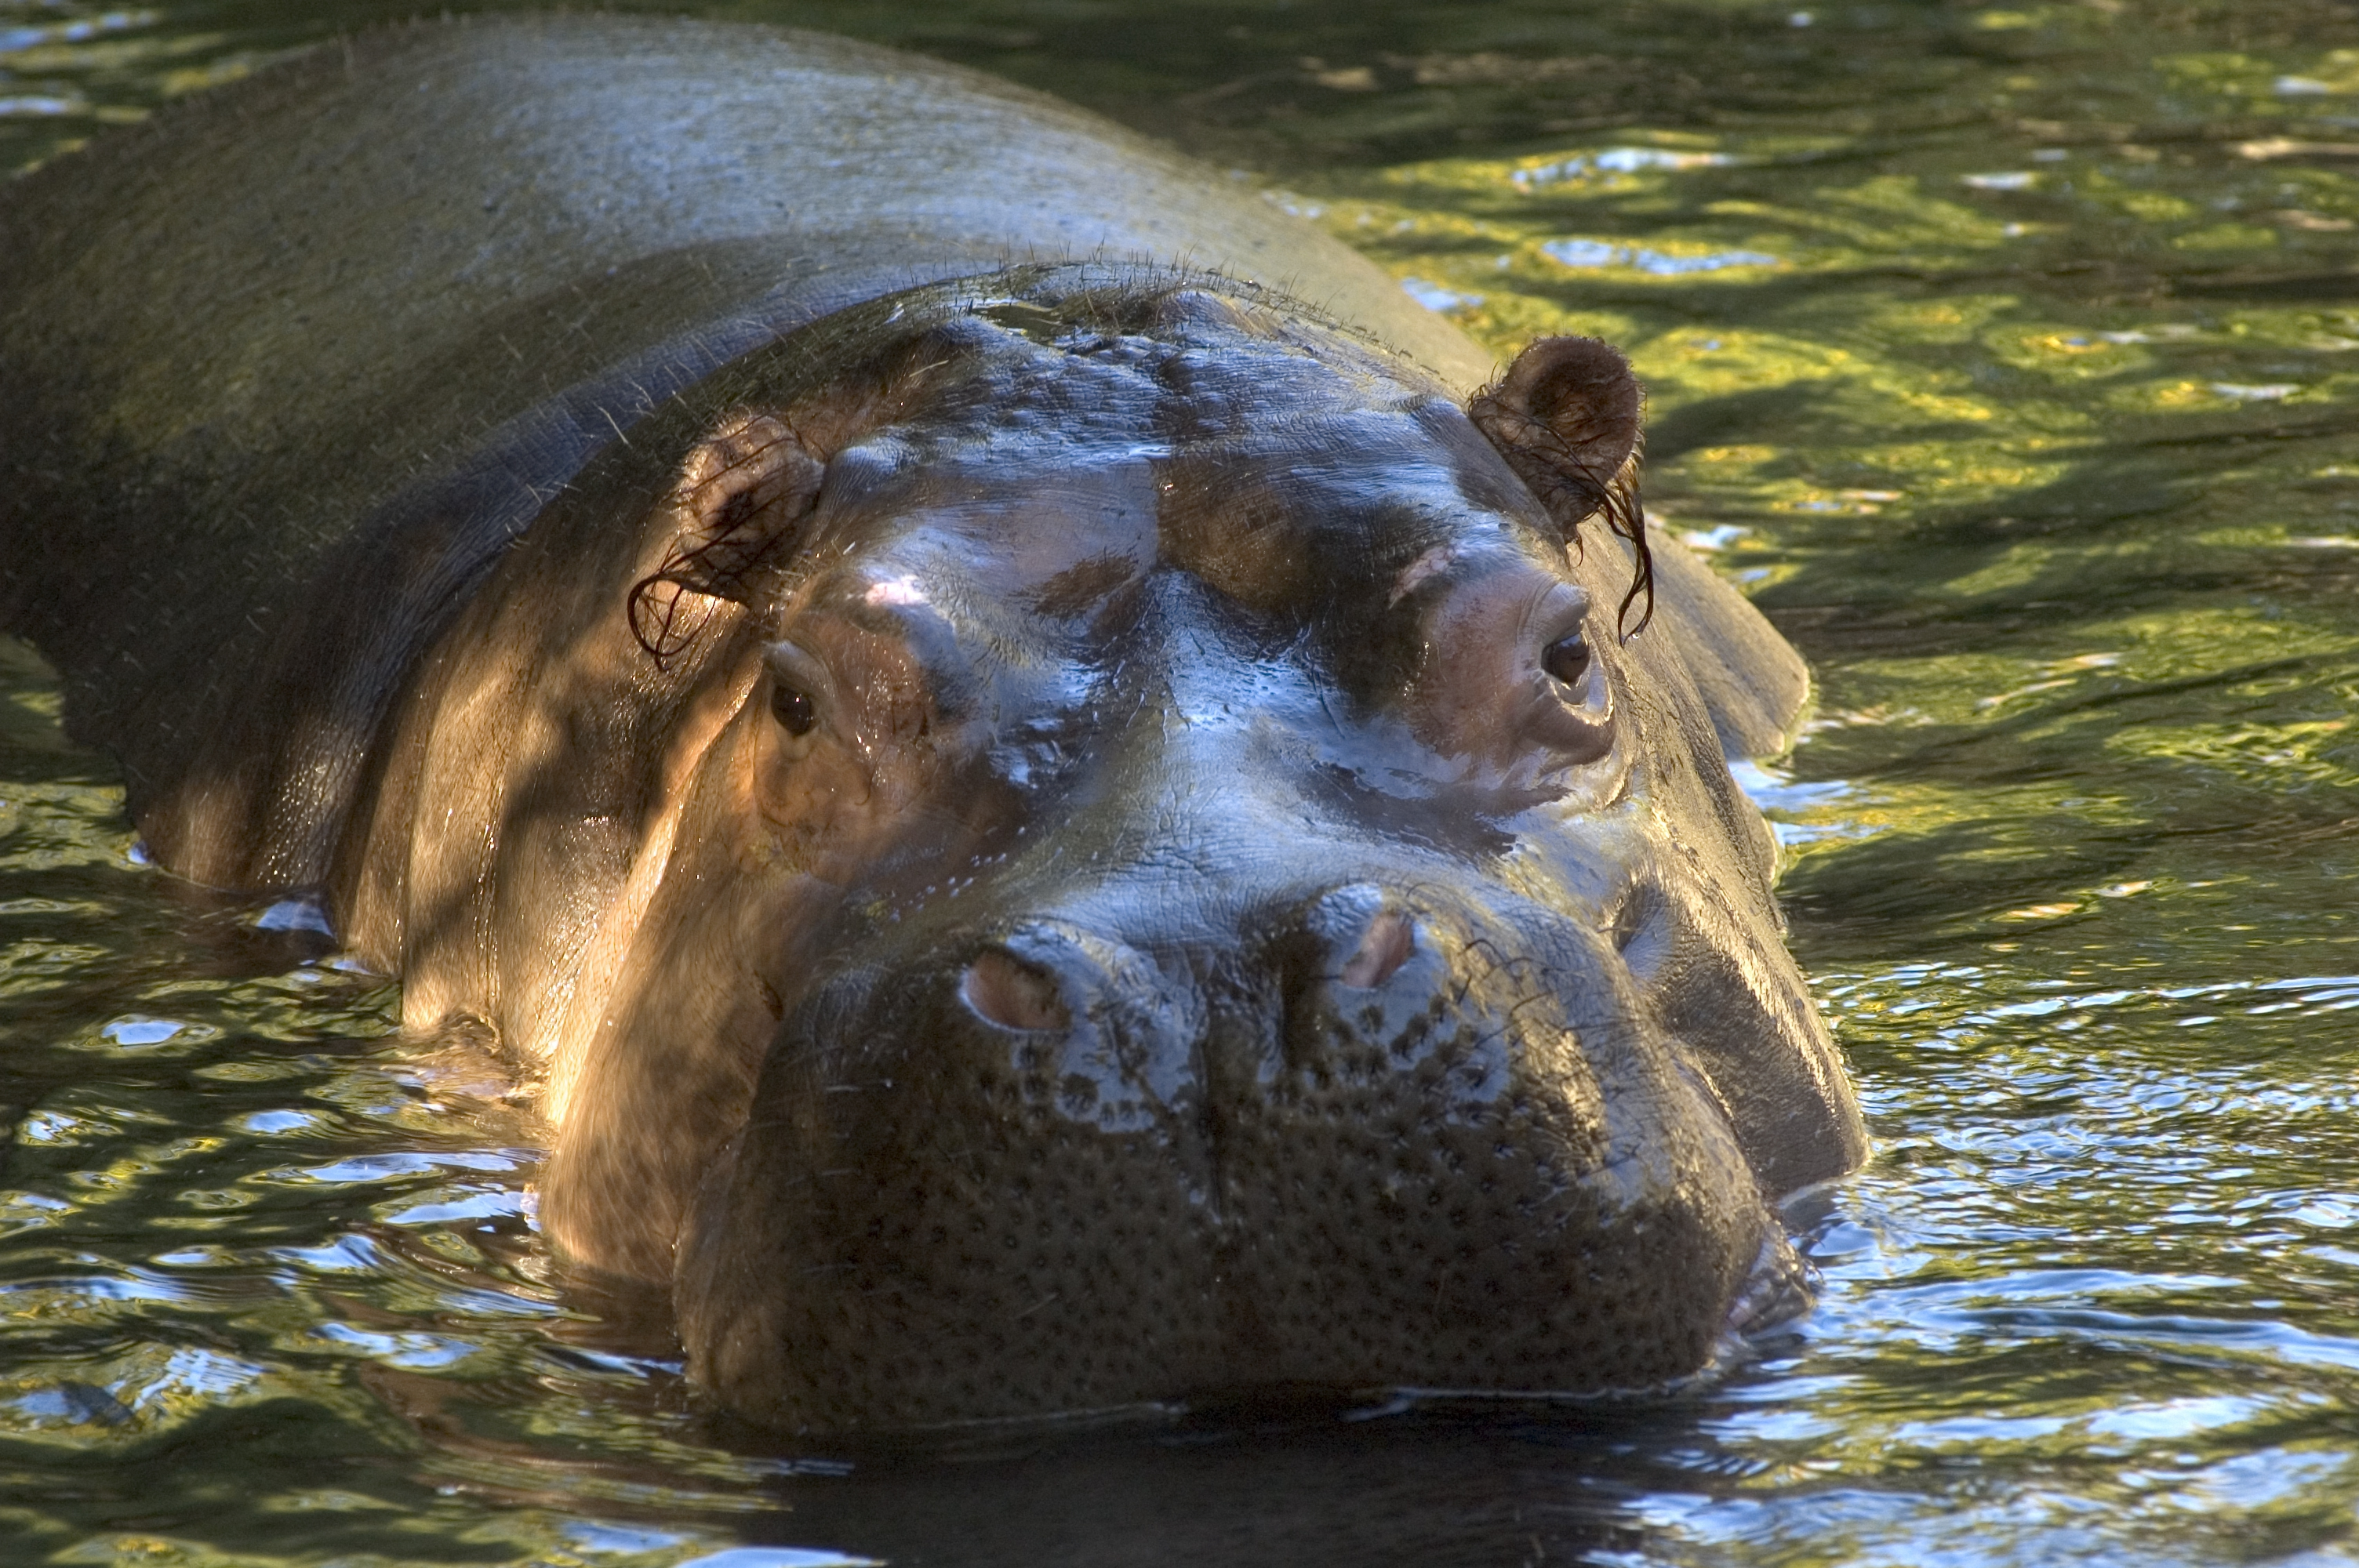 Hippopotamus Download Free Backgrounds Hd